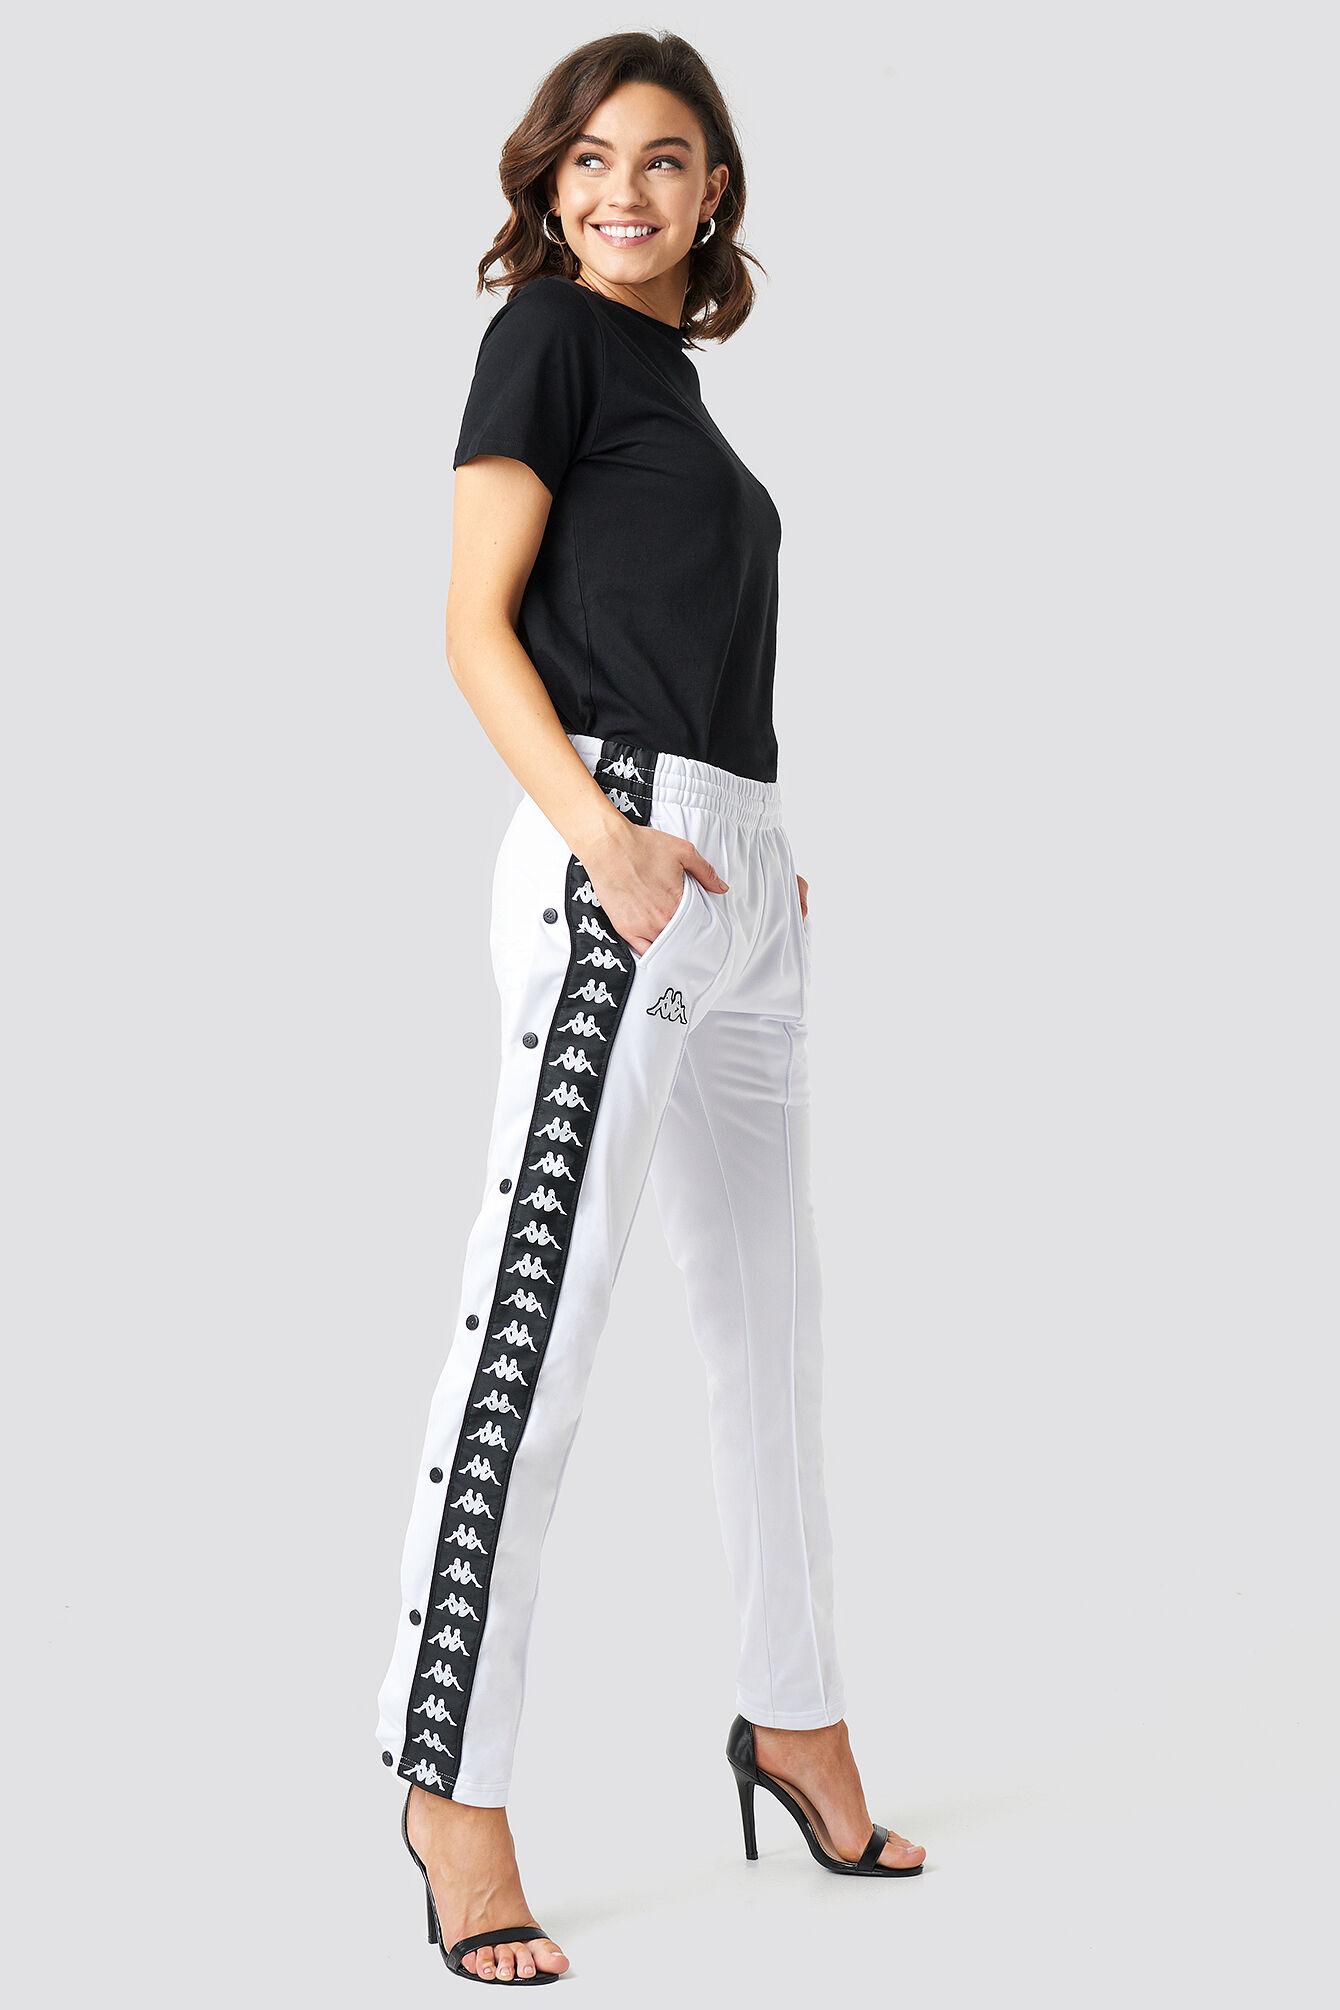 Kappa Astoria Slim Pants - White